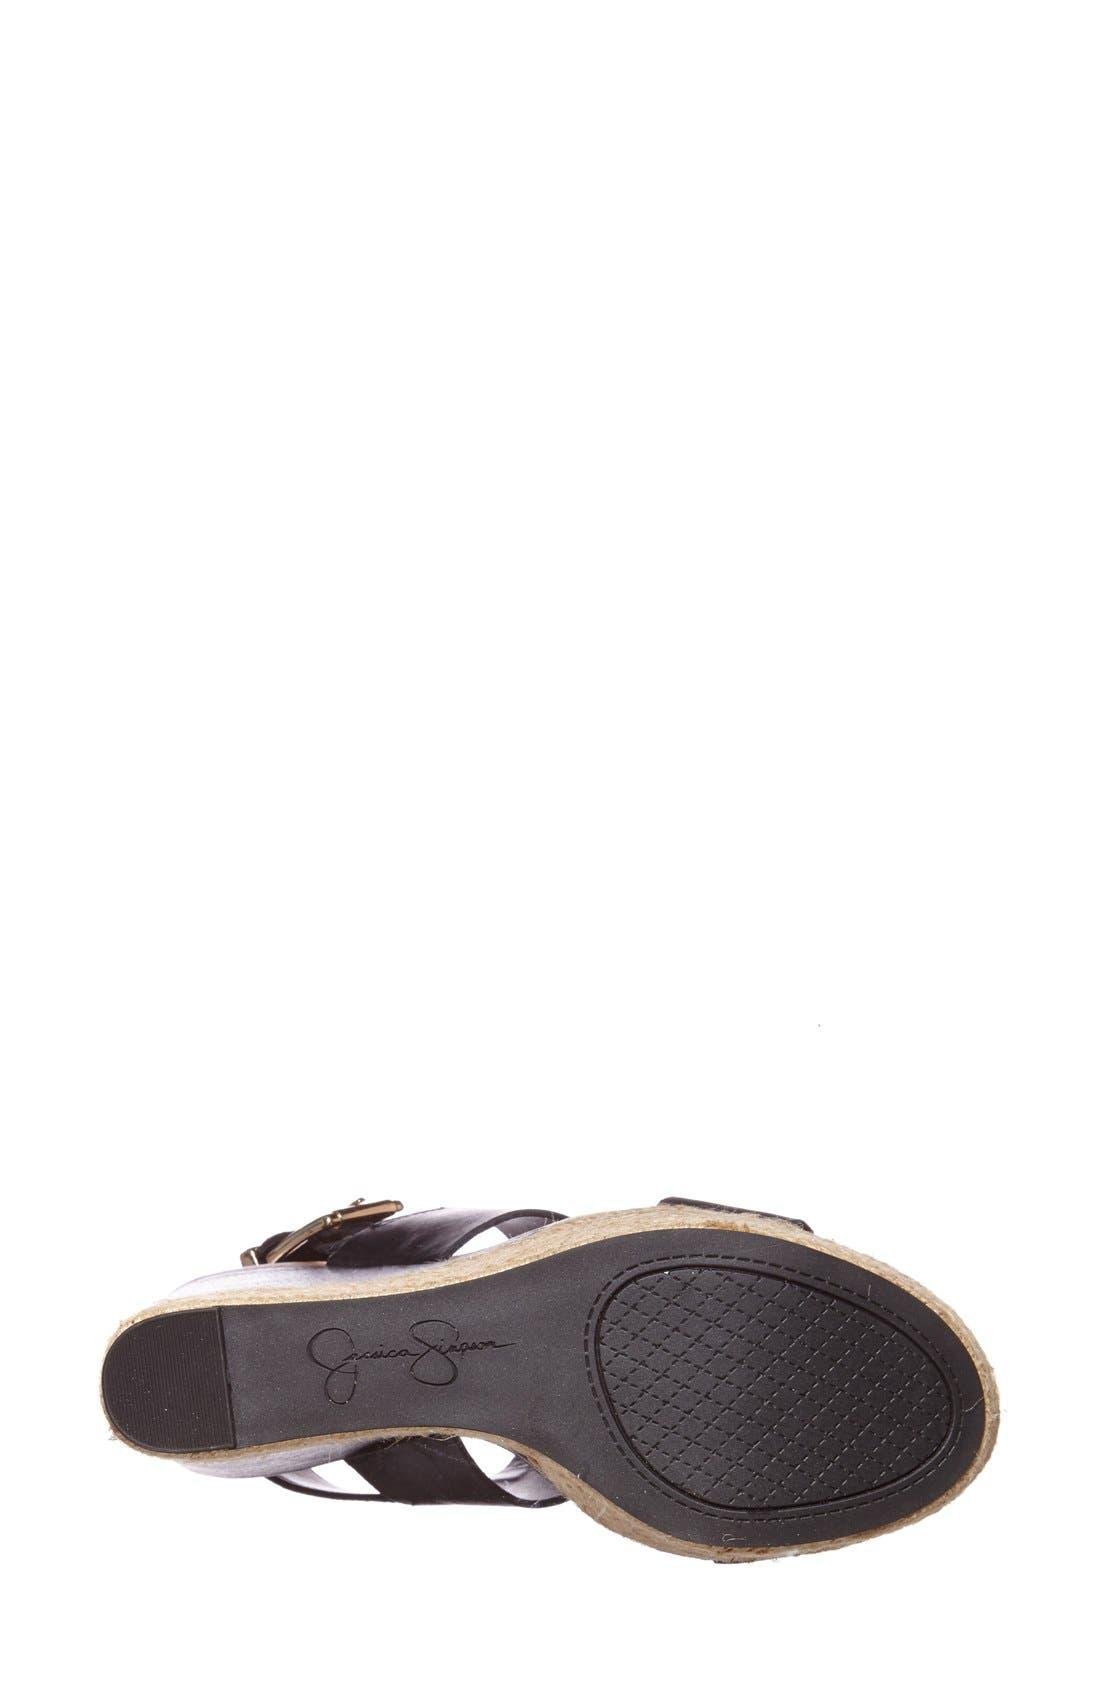 'Allyn' Wedge Platform Leather Sandal,                             Alternate thumbnail 2, color,                             001